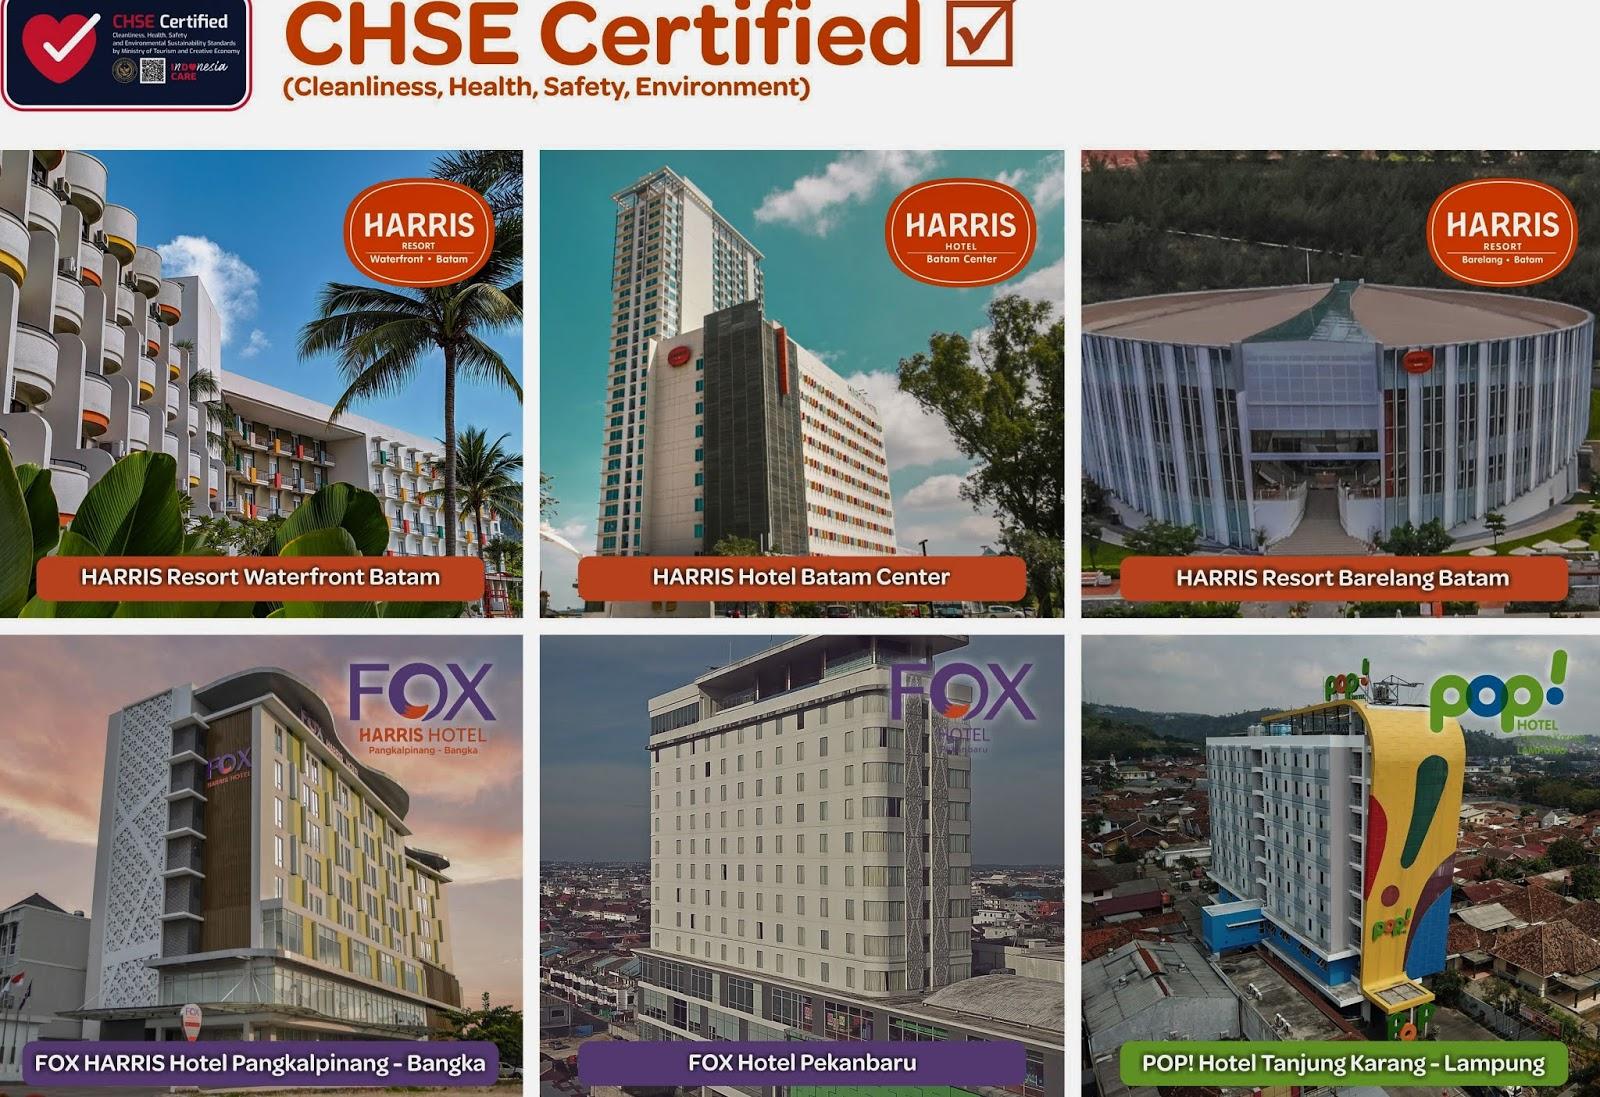 Tauzia Hotels Regional Sumatera Raih Sertifikat CHSE Kemenparekraf Batam